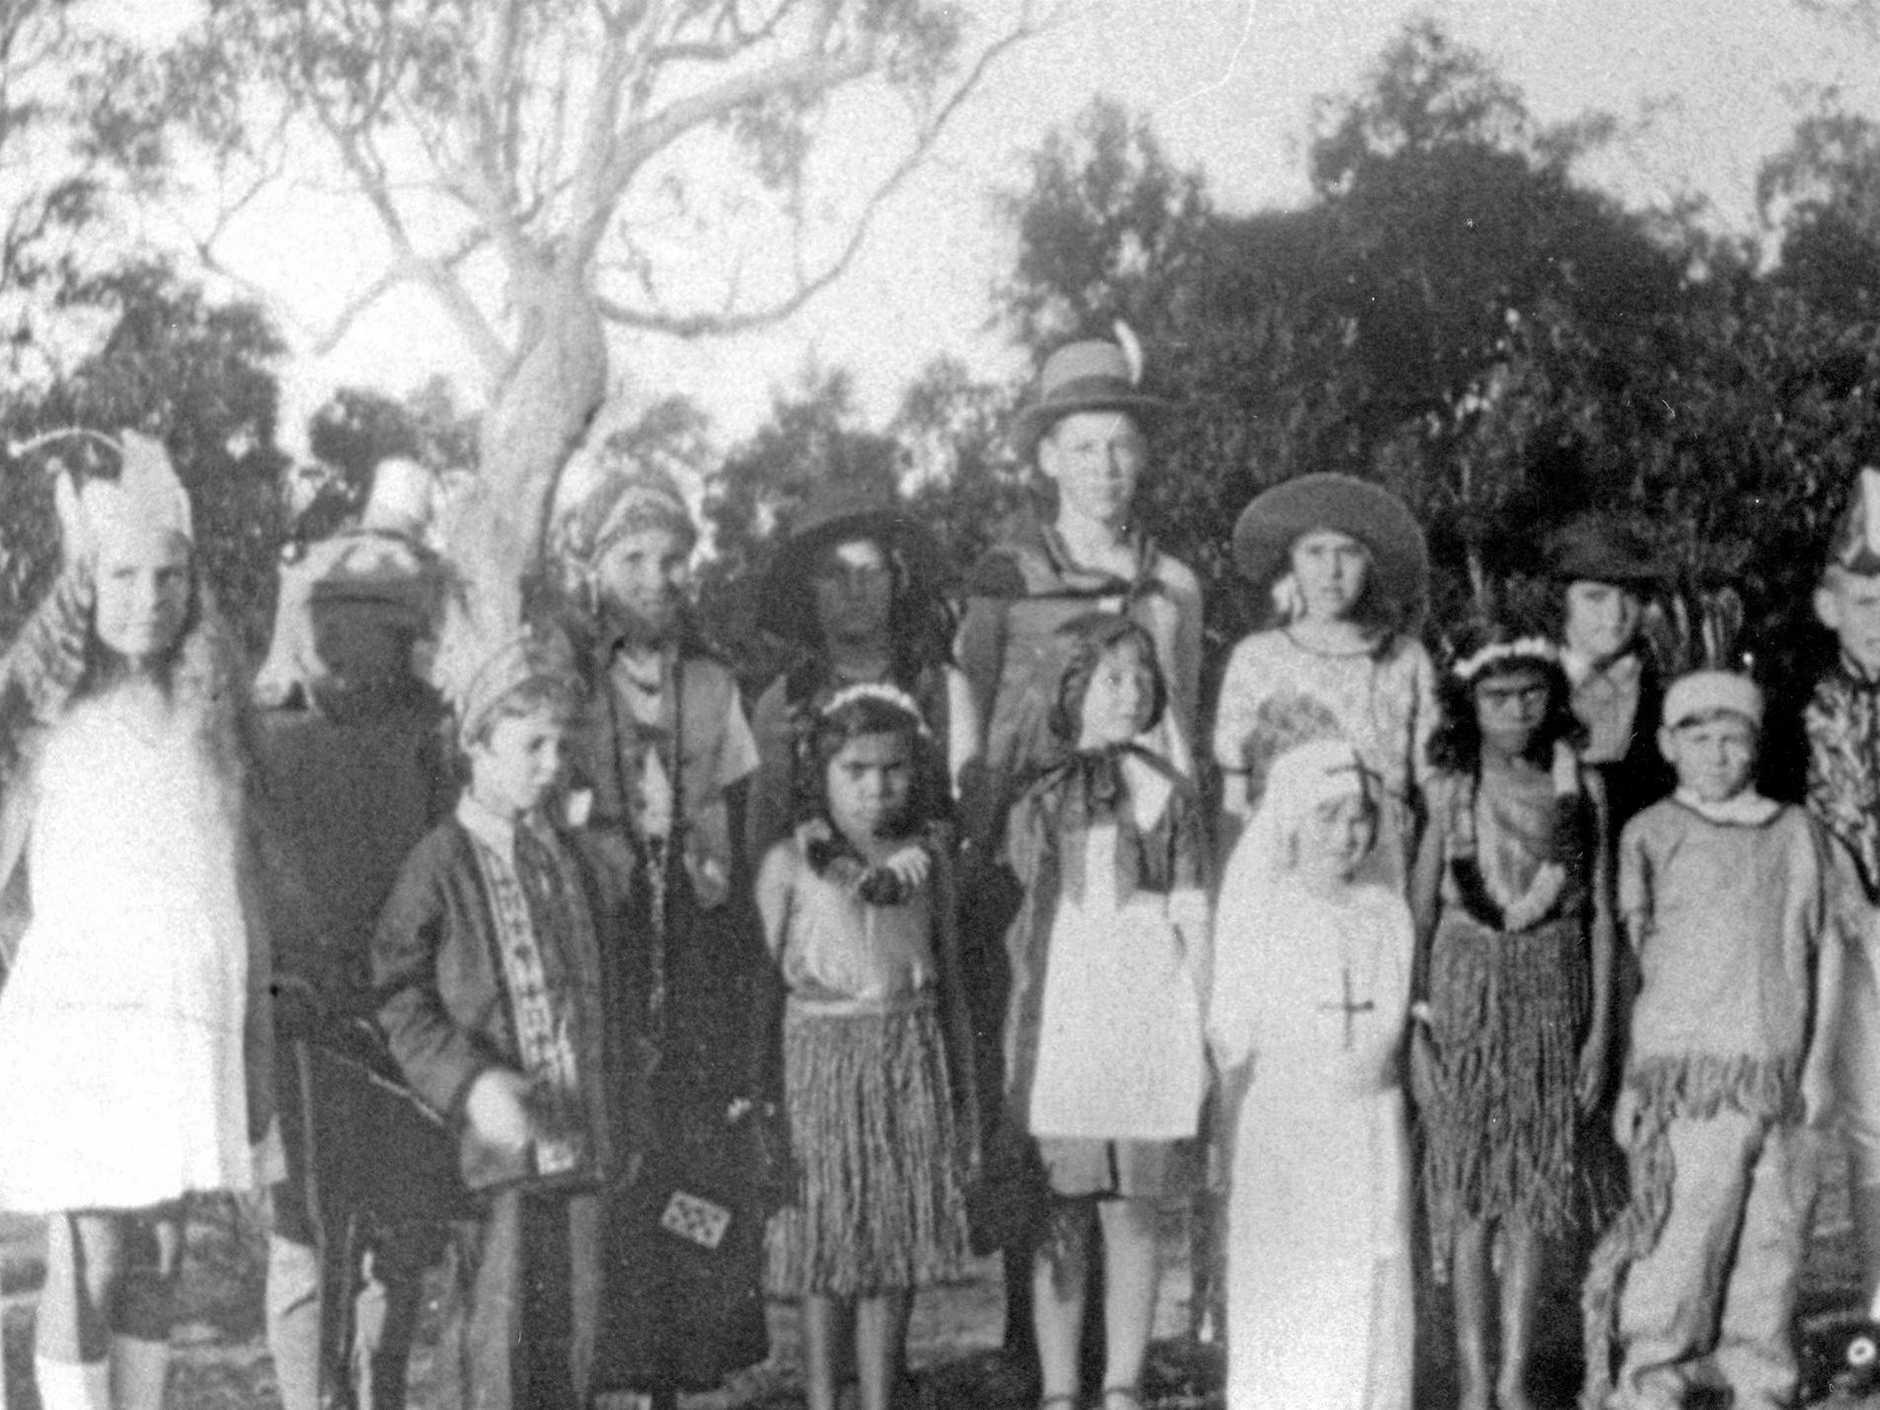 Caloundra Primary School students in fancy dress, in 1934.